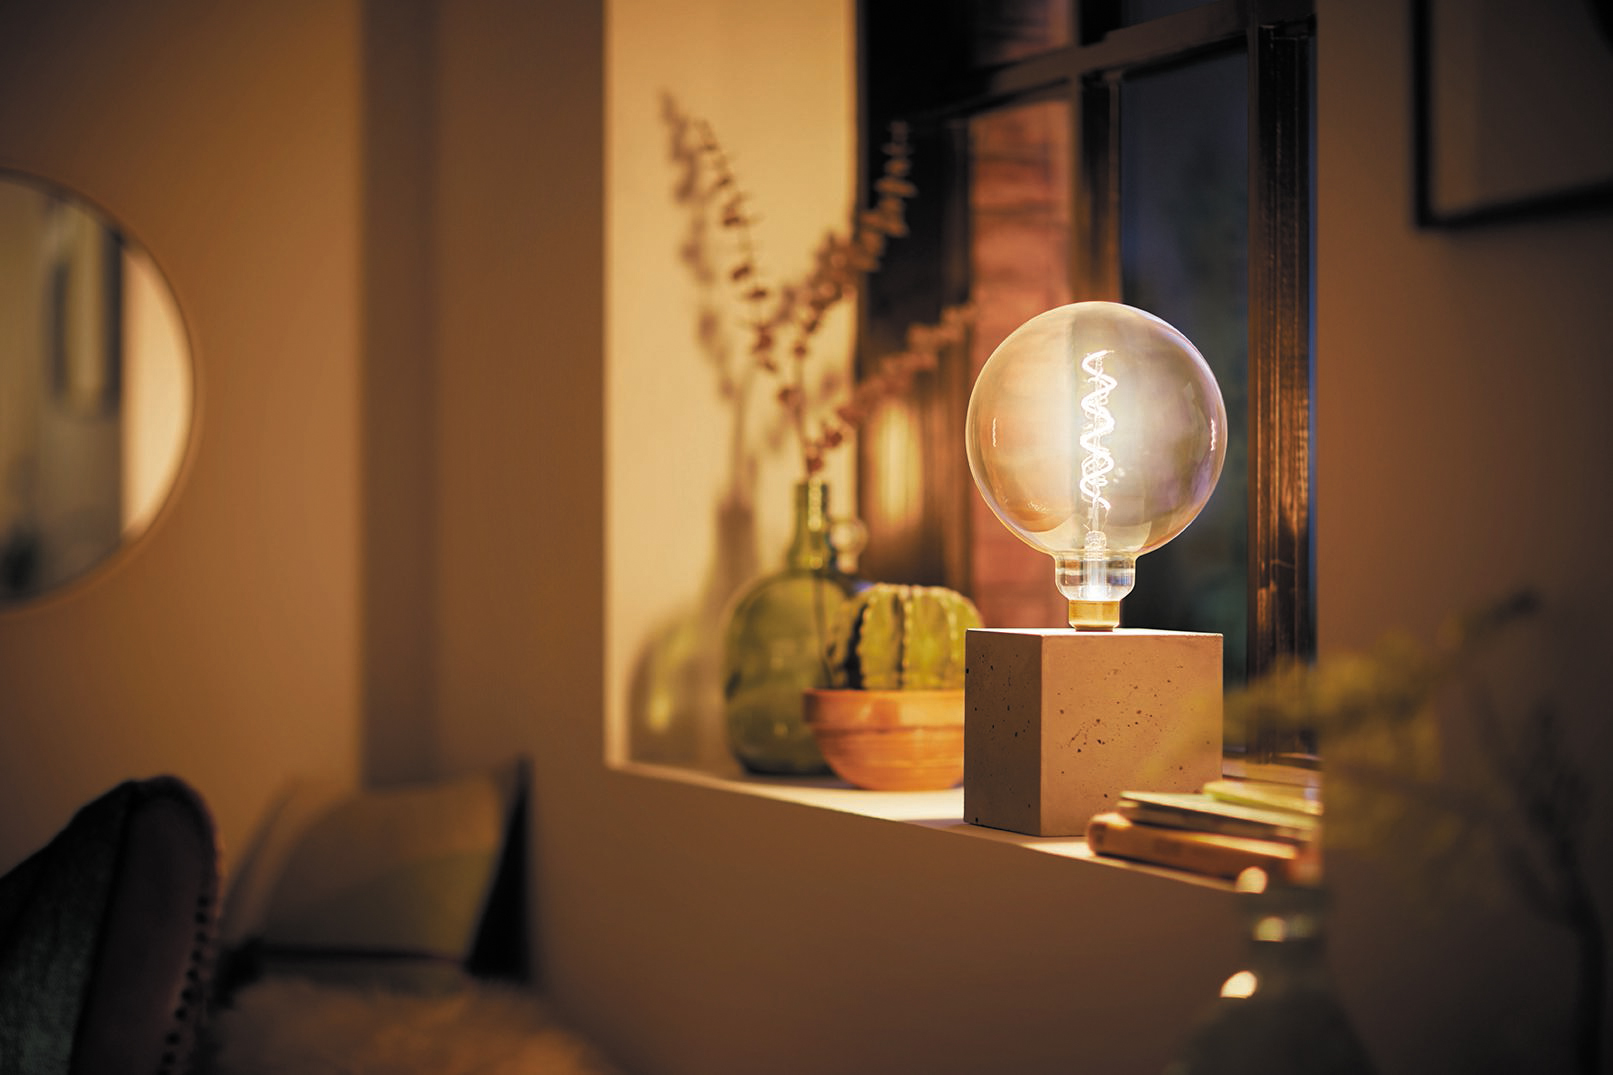 Vintage led lampen von philips lighting newsroom philips lighting